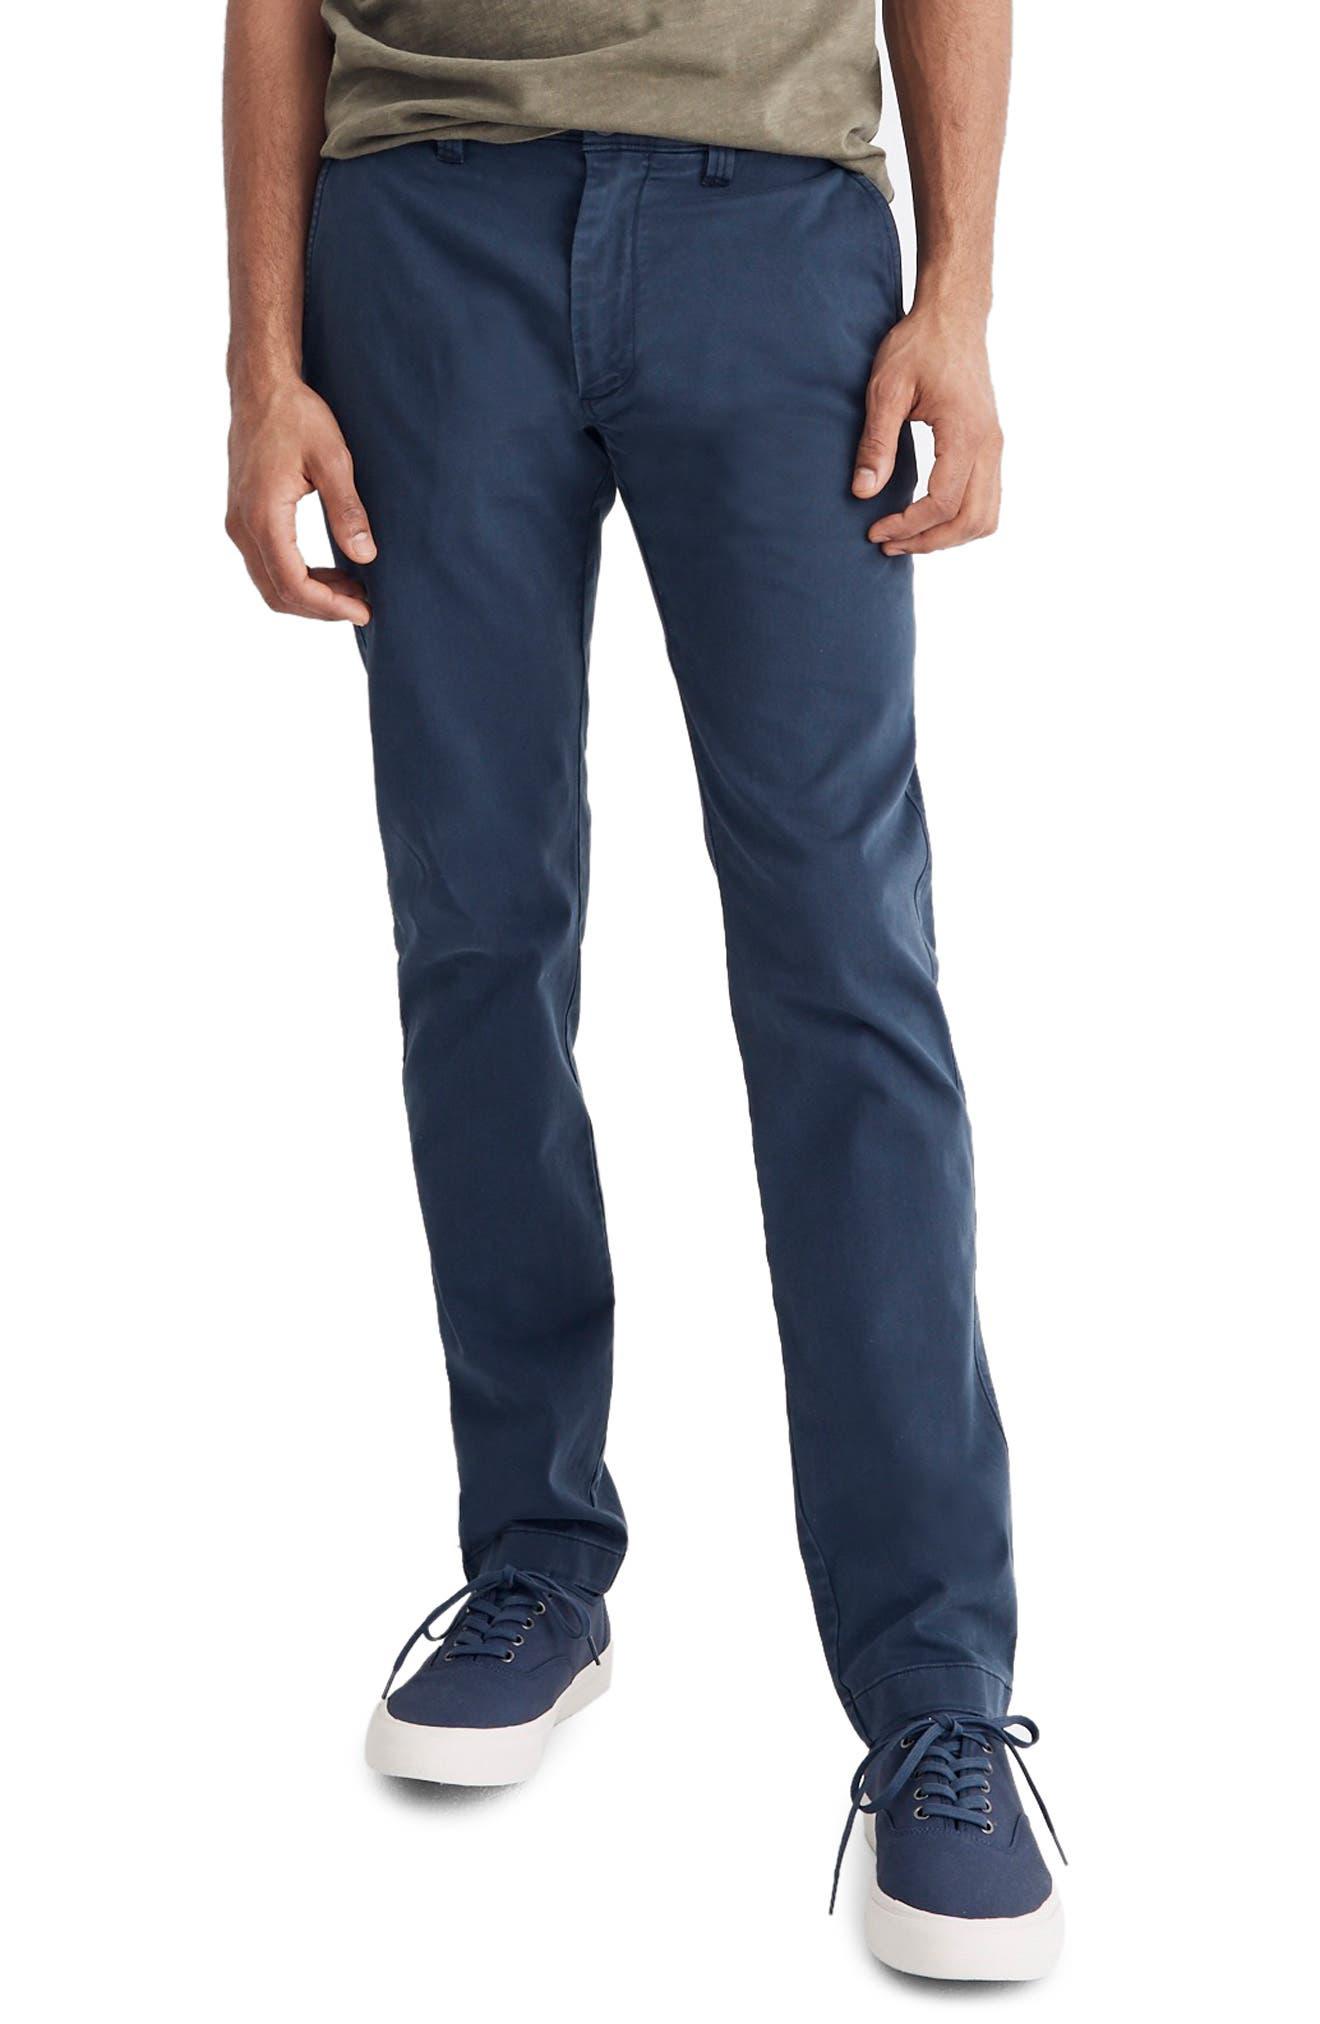 Madewell Penn Slim Fit Chino Pants - Blue